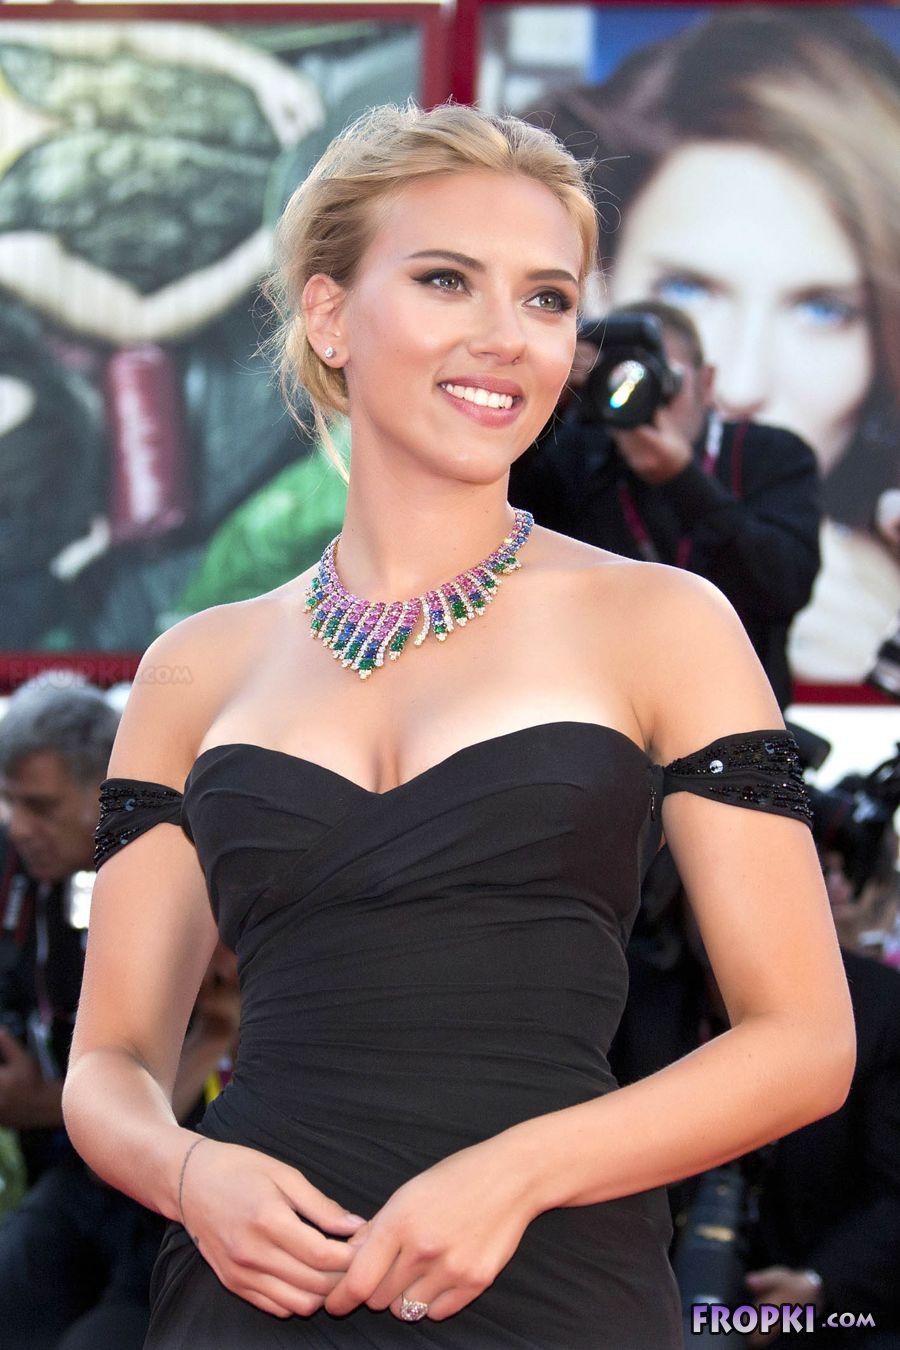 Scarlett Johansson Fropki 37